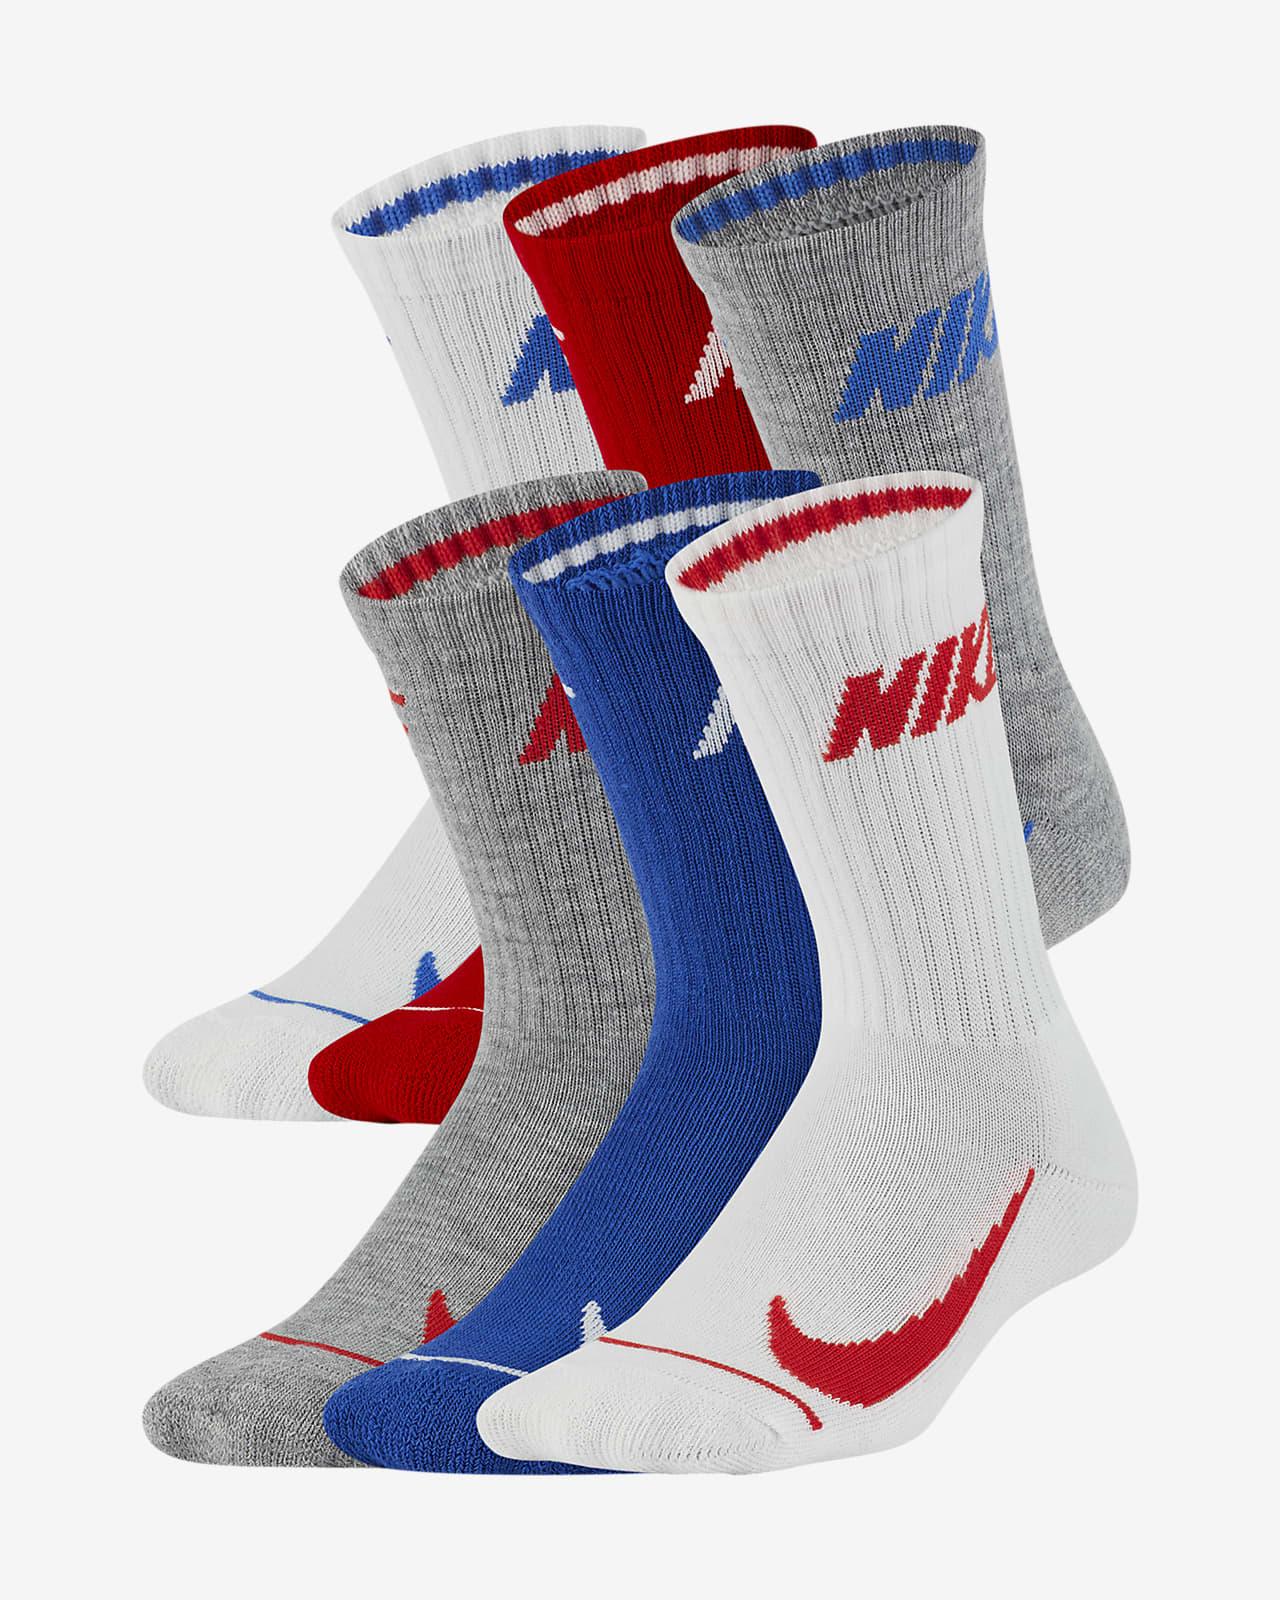 Nike Little Kids' Crew Socks (6 Pairs)